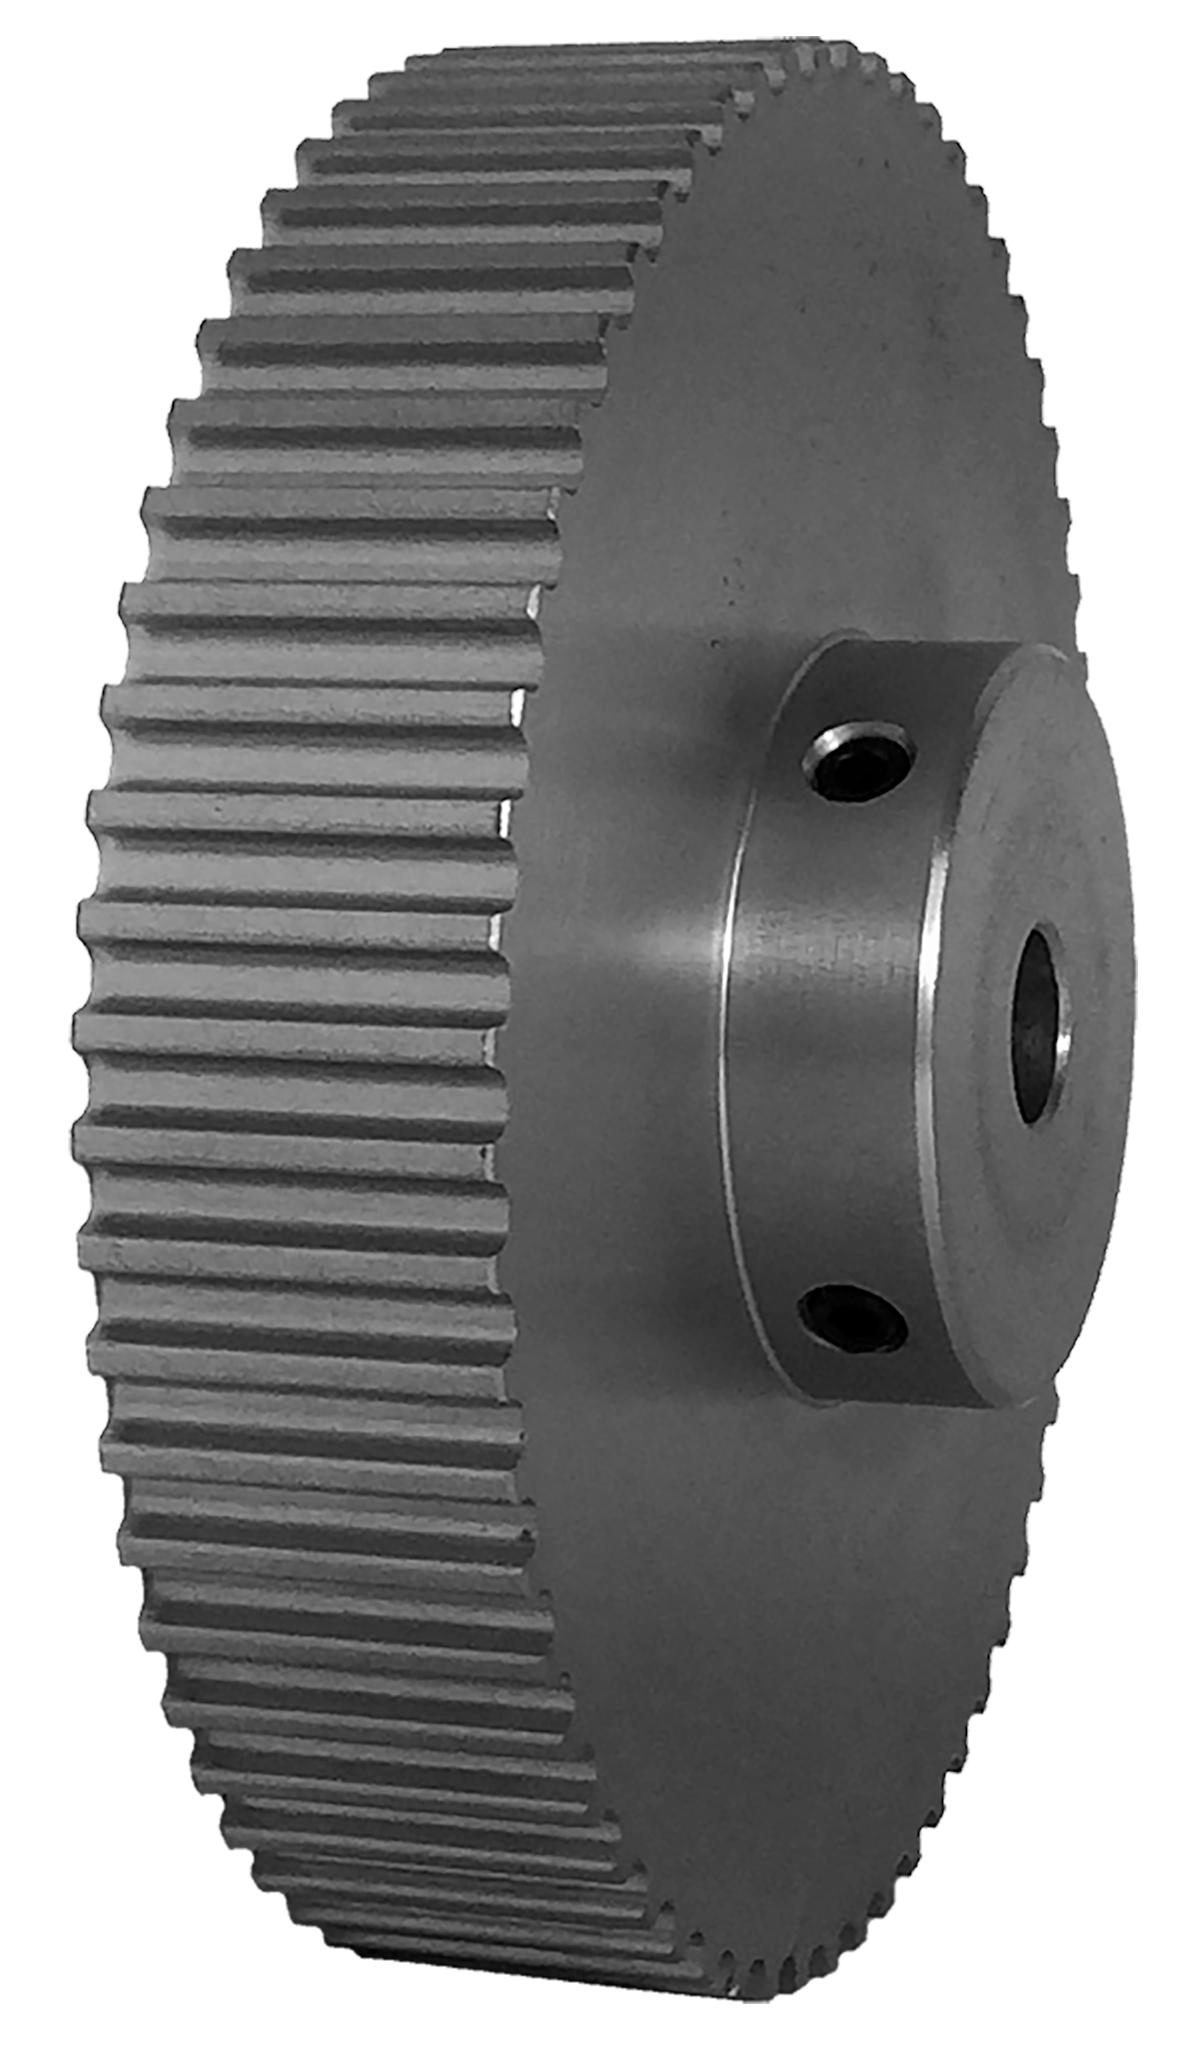 62-5M15-6A5 - Aluminum Powerhouse®HTD® Pulleys